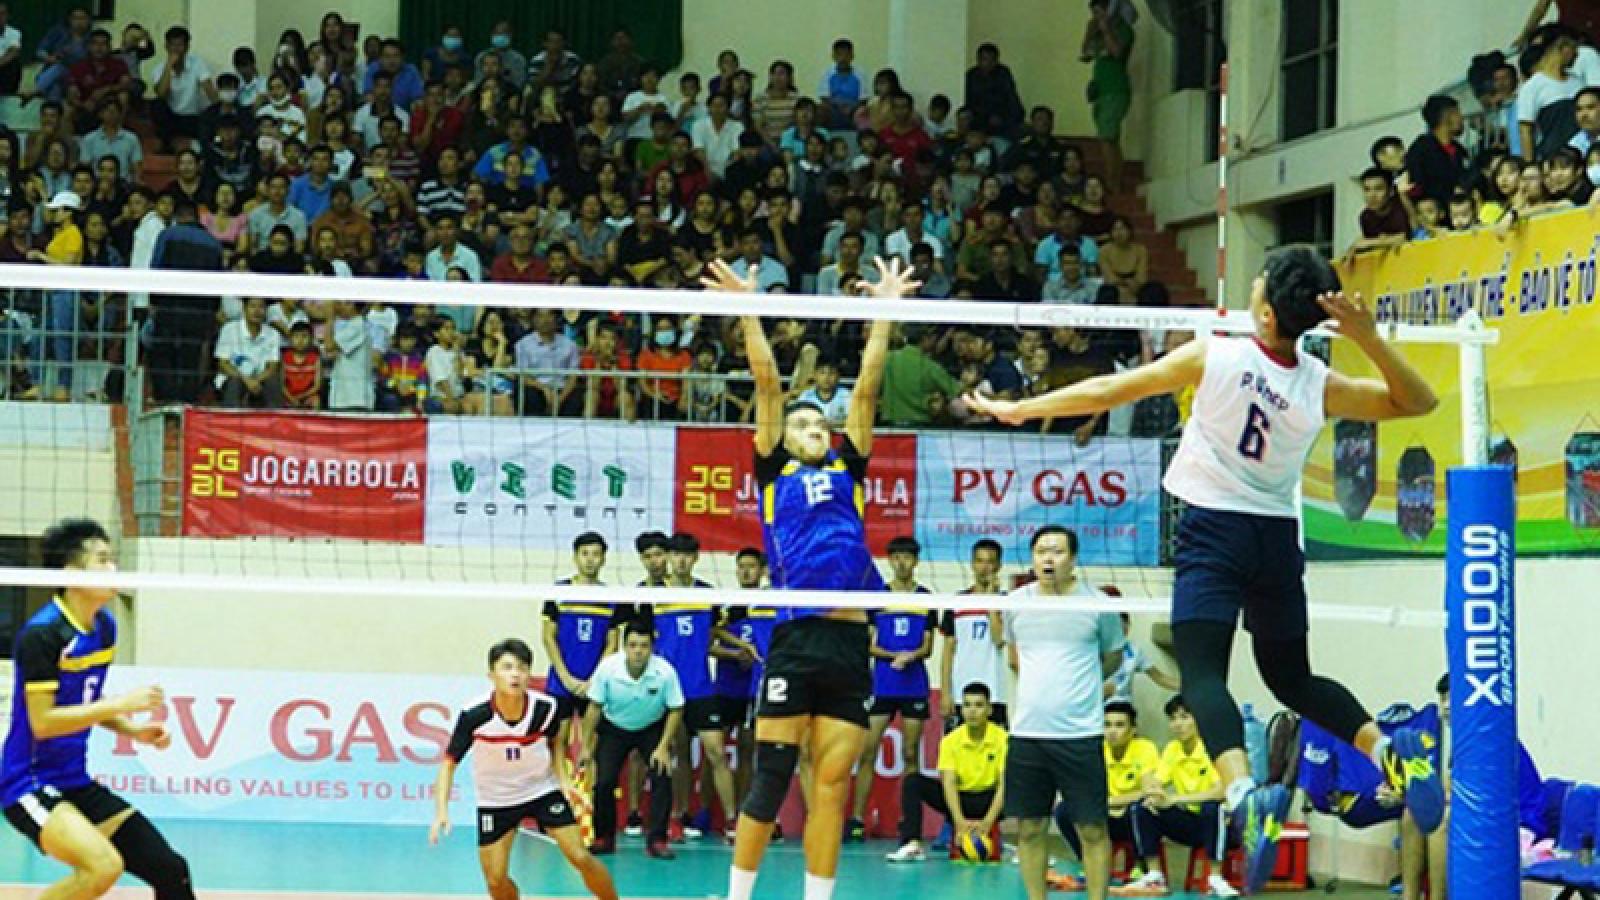 Border and Vietinbank triumph at national U23 volleyball championships